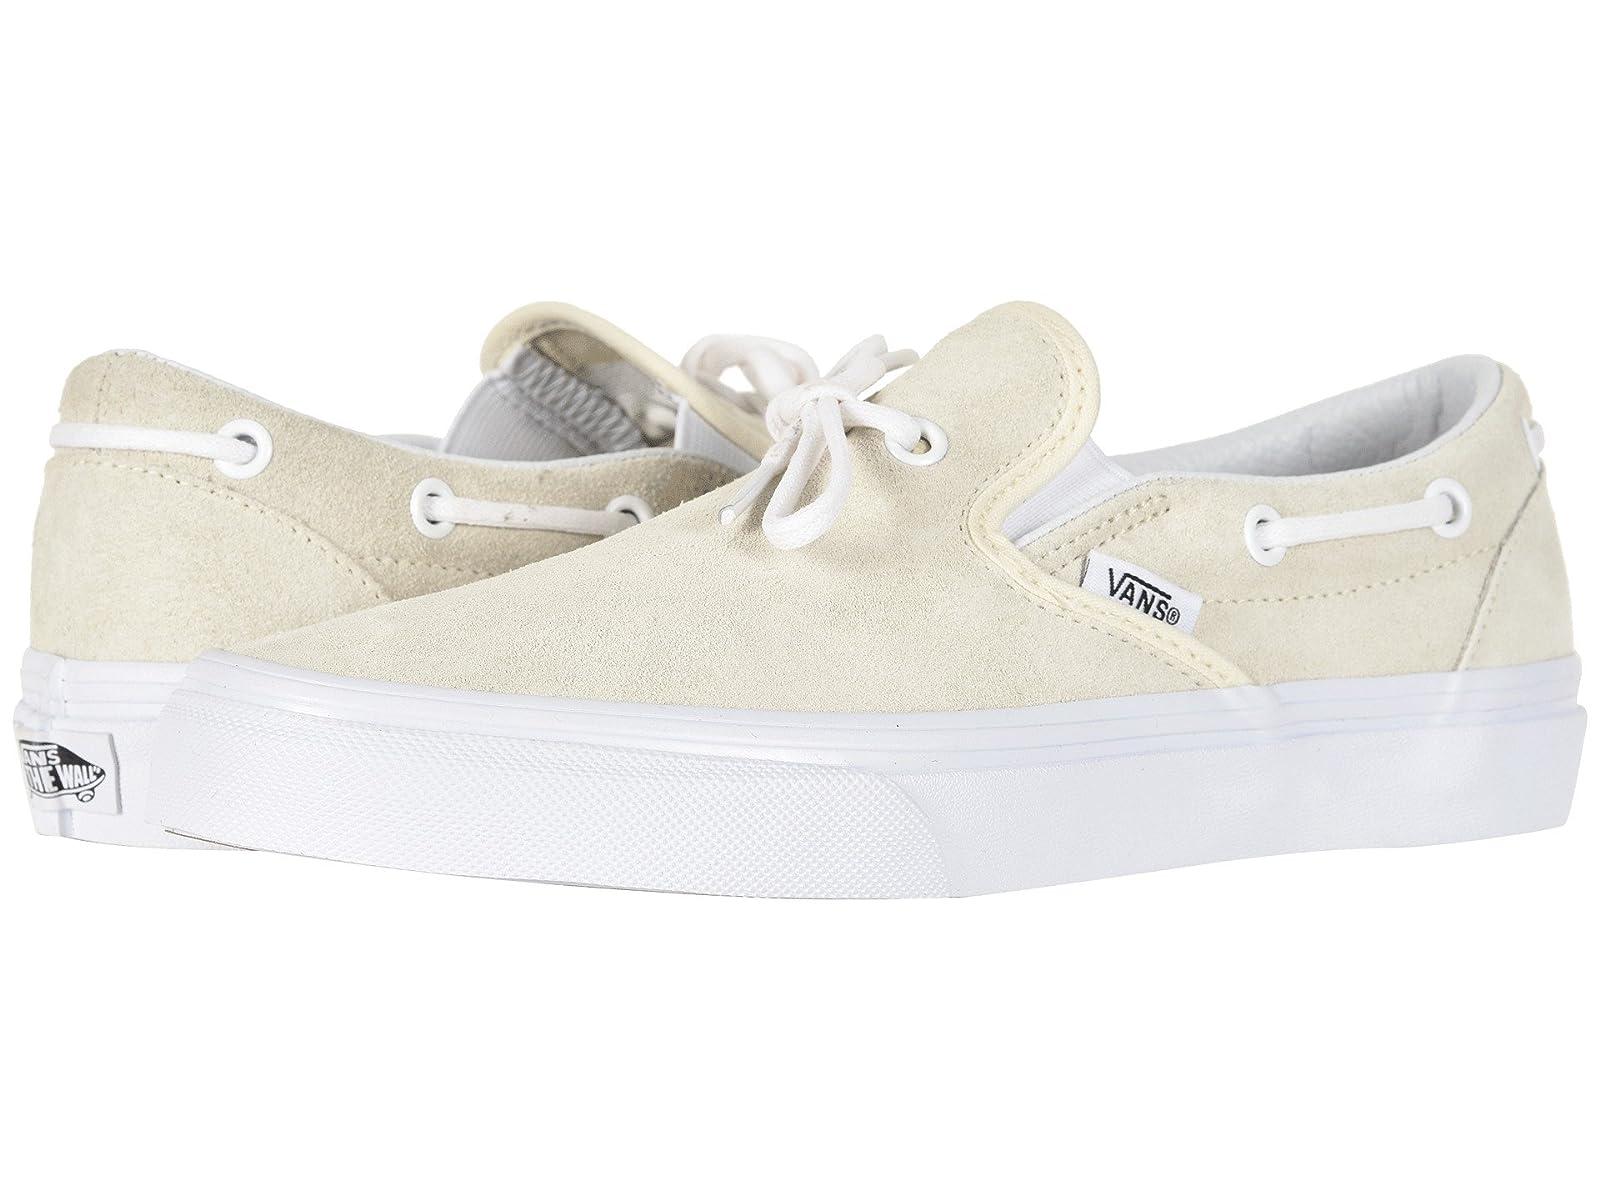 Vans Lacey 72Atmospheric grades have affordable shoes